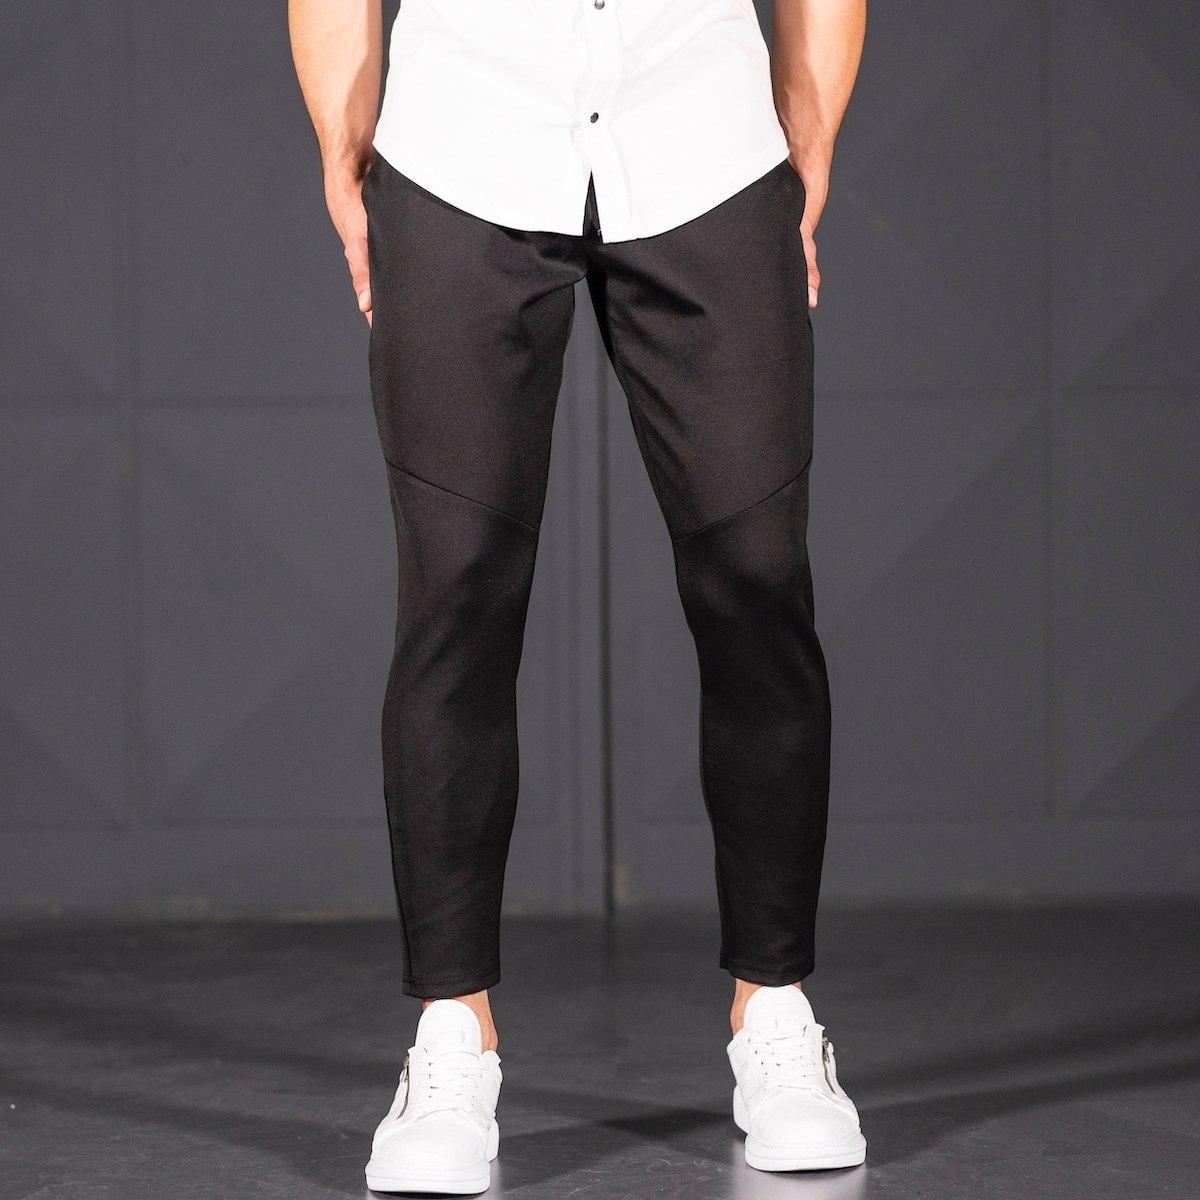 Horizonal Stitched Joggers In Black Mv Premium Brand - 2